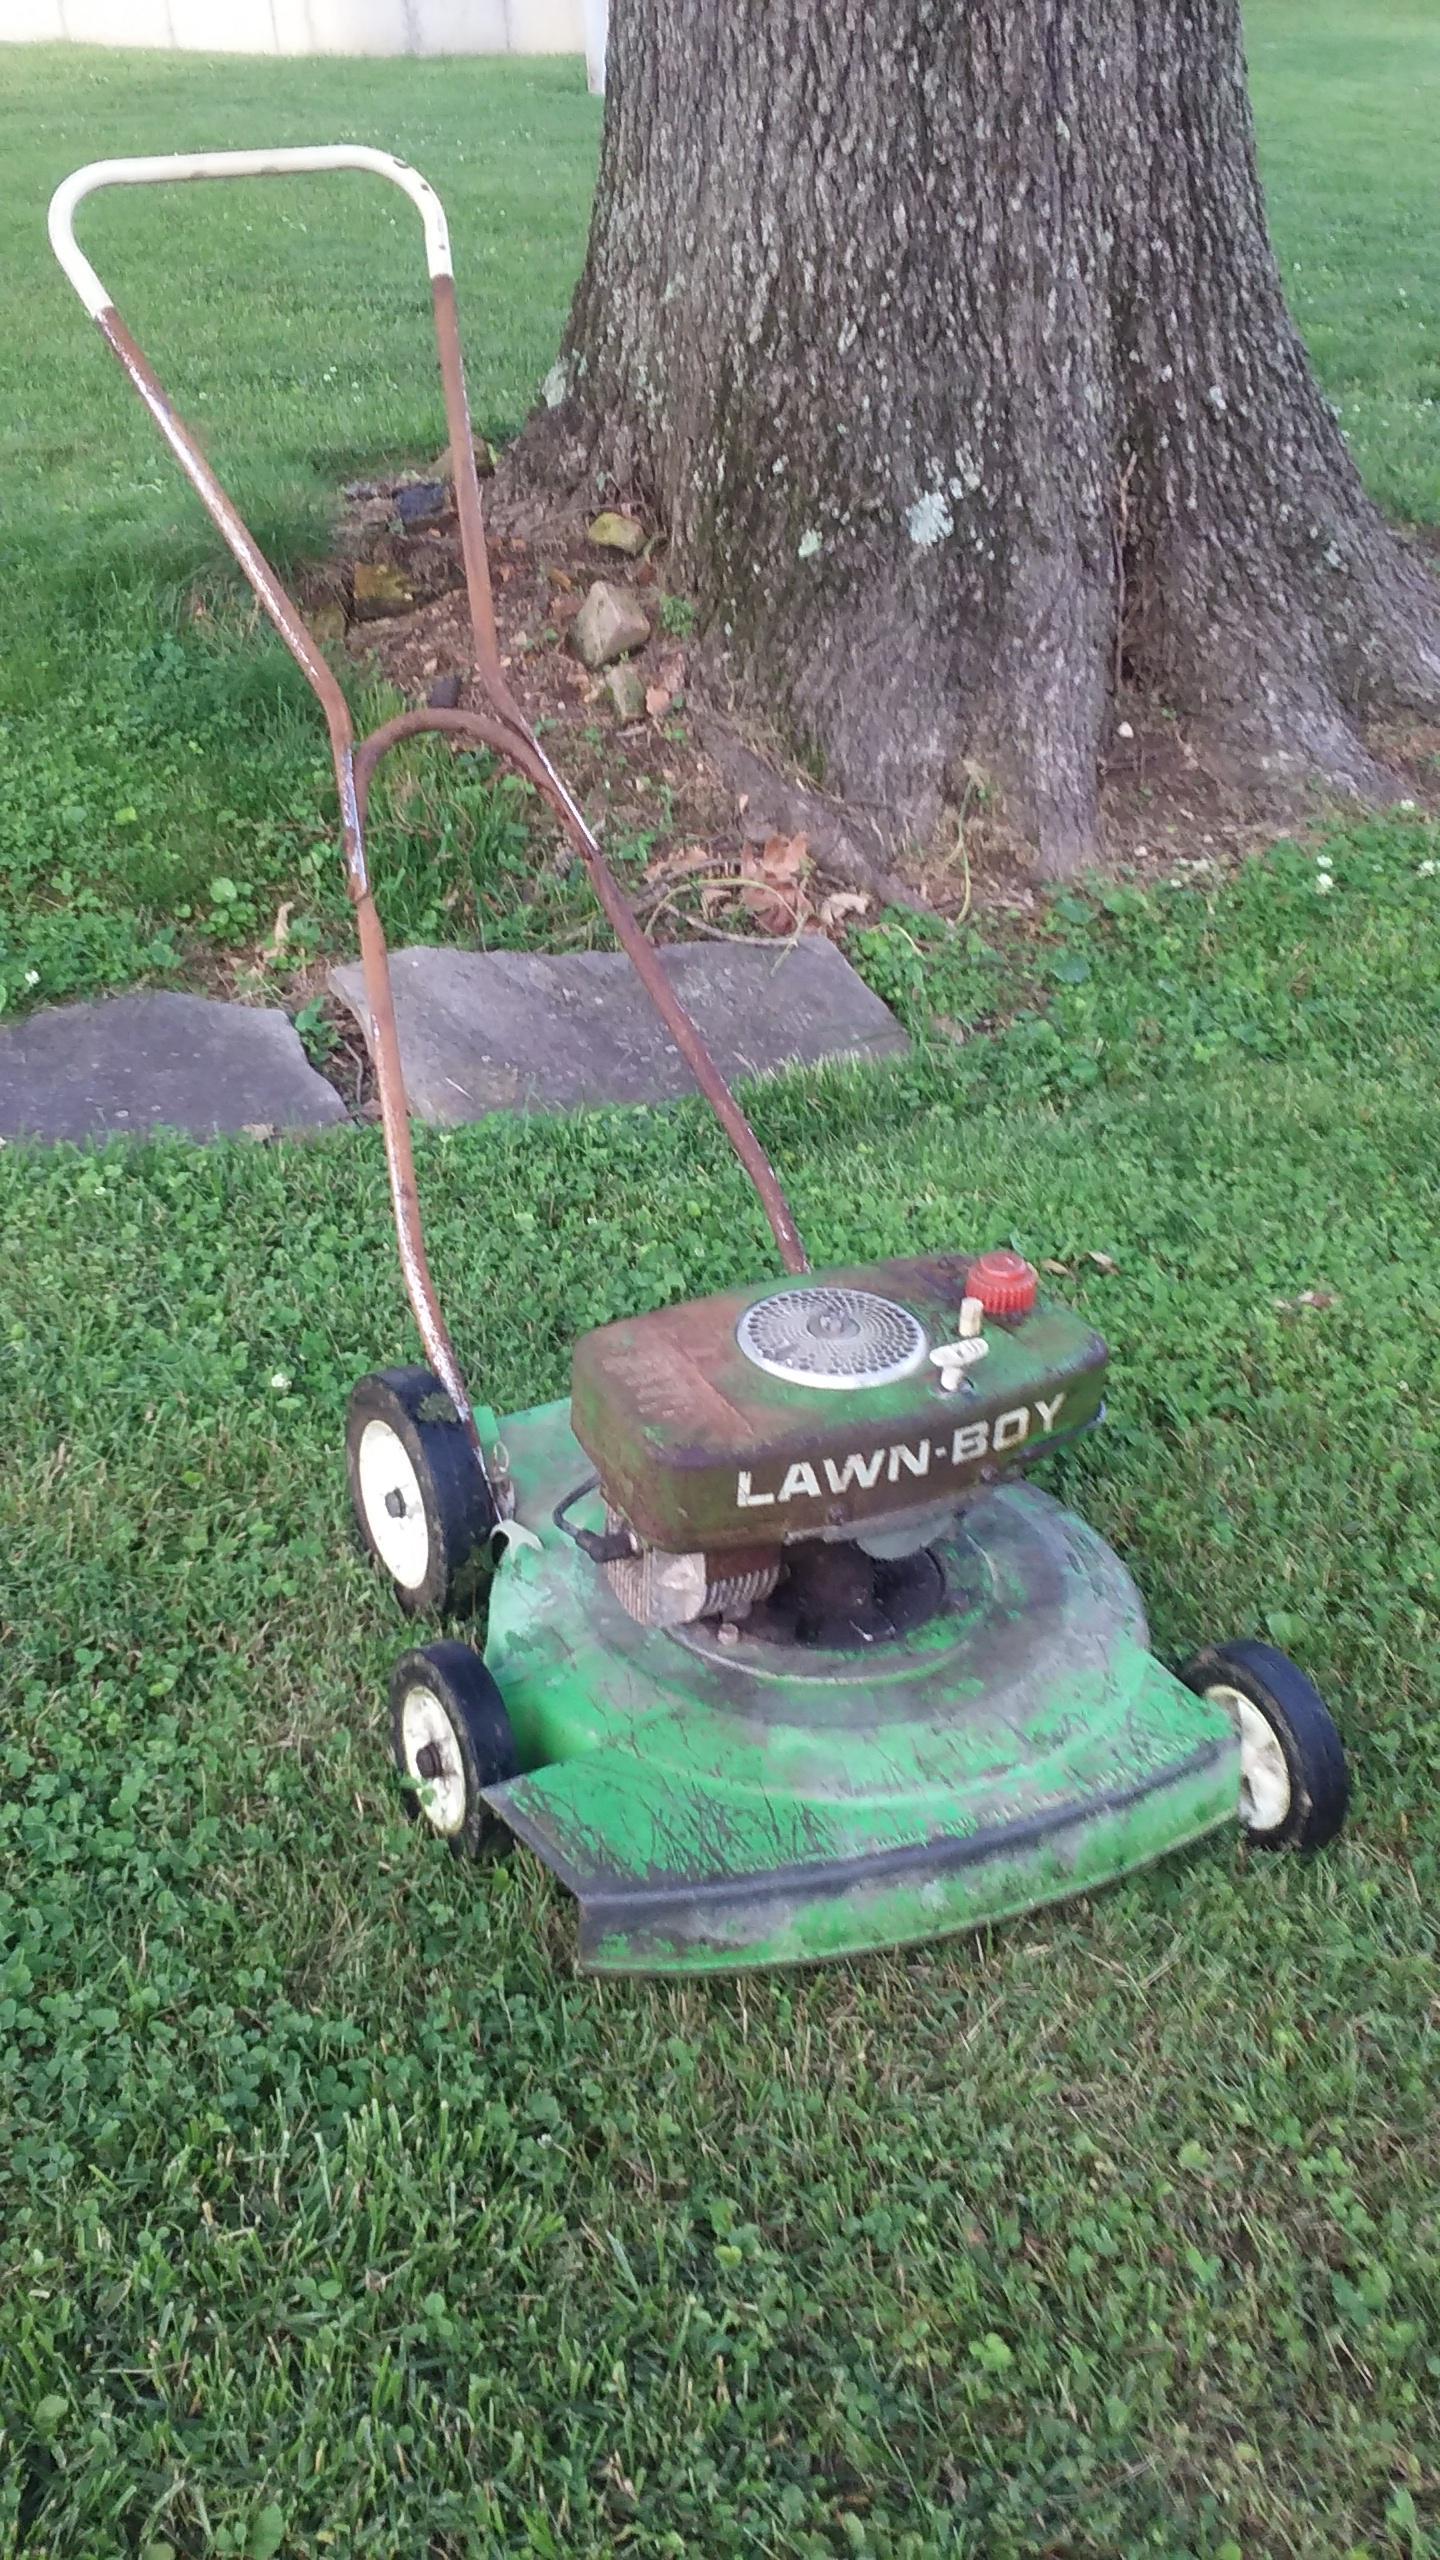 lightest mower mytractorforumcom the friendliest tractor forum